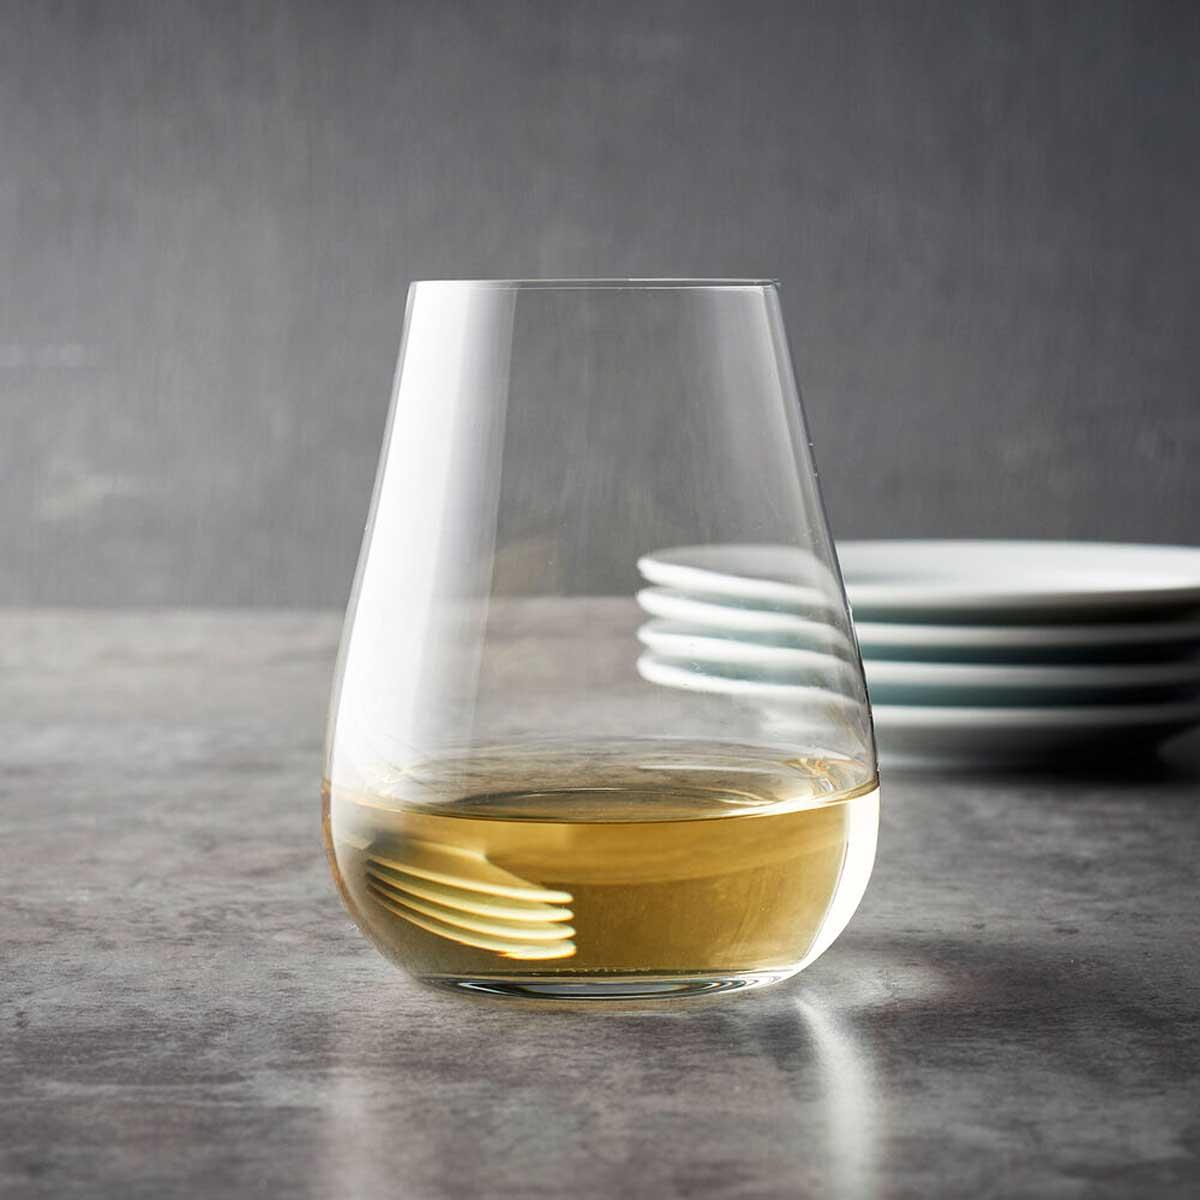 Schott Sqiesel Air Stemless White Wine Glasses